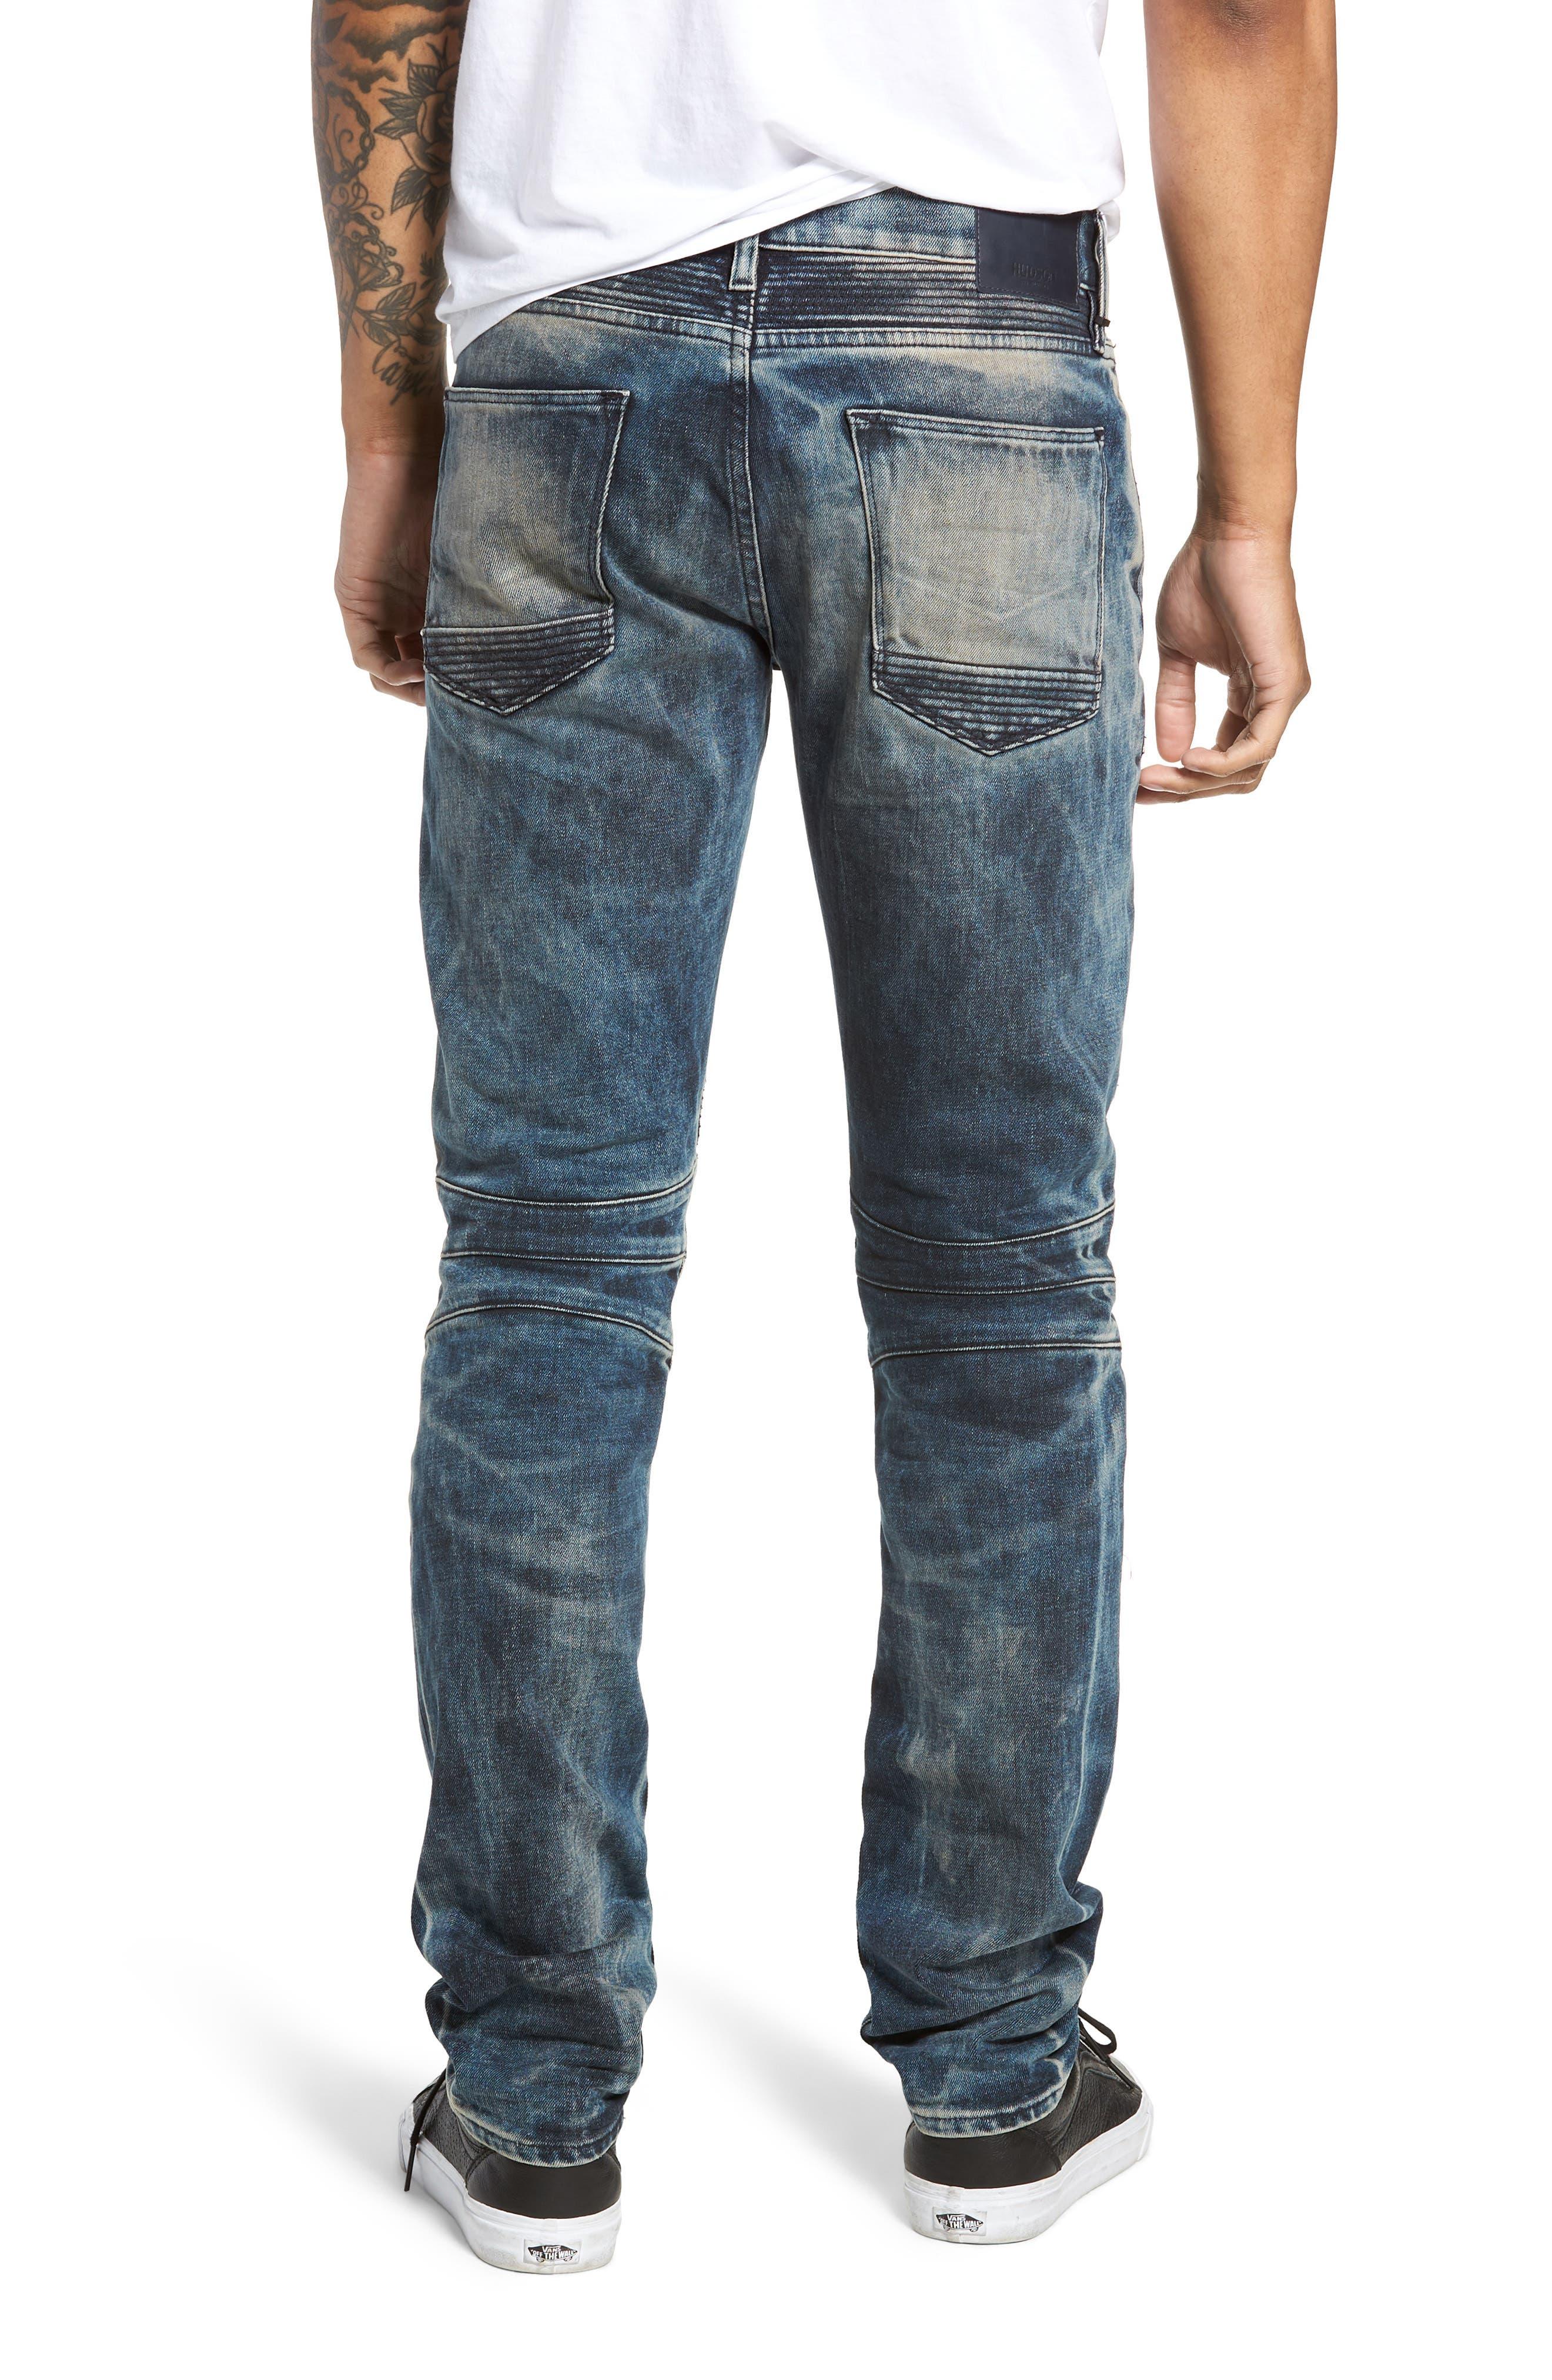 Blinder Biker Skinny Fit Jeans,                             Alternate thumbnail 2, color,                             MARTINO